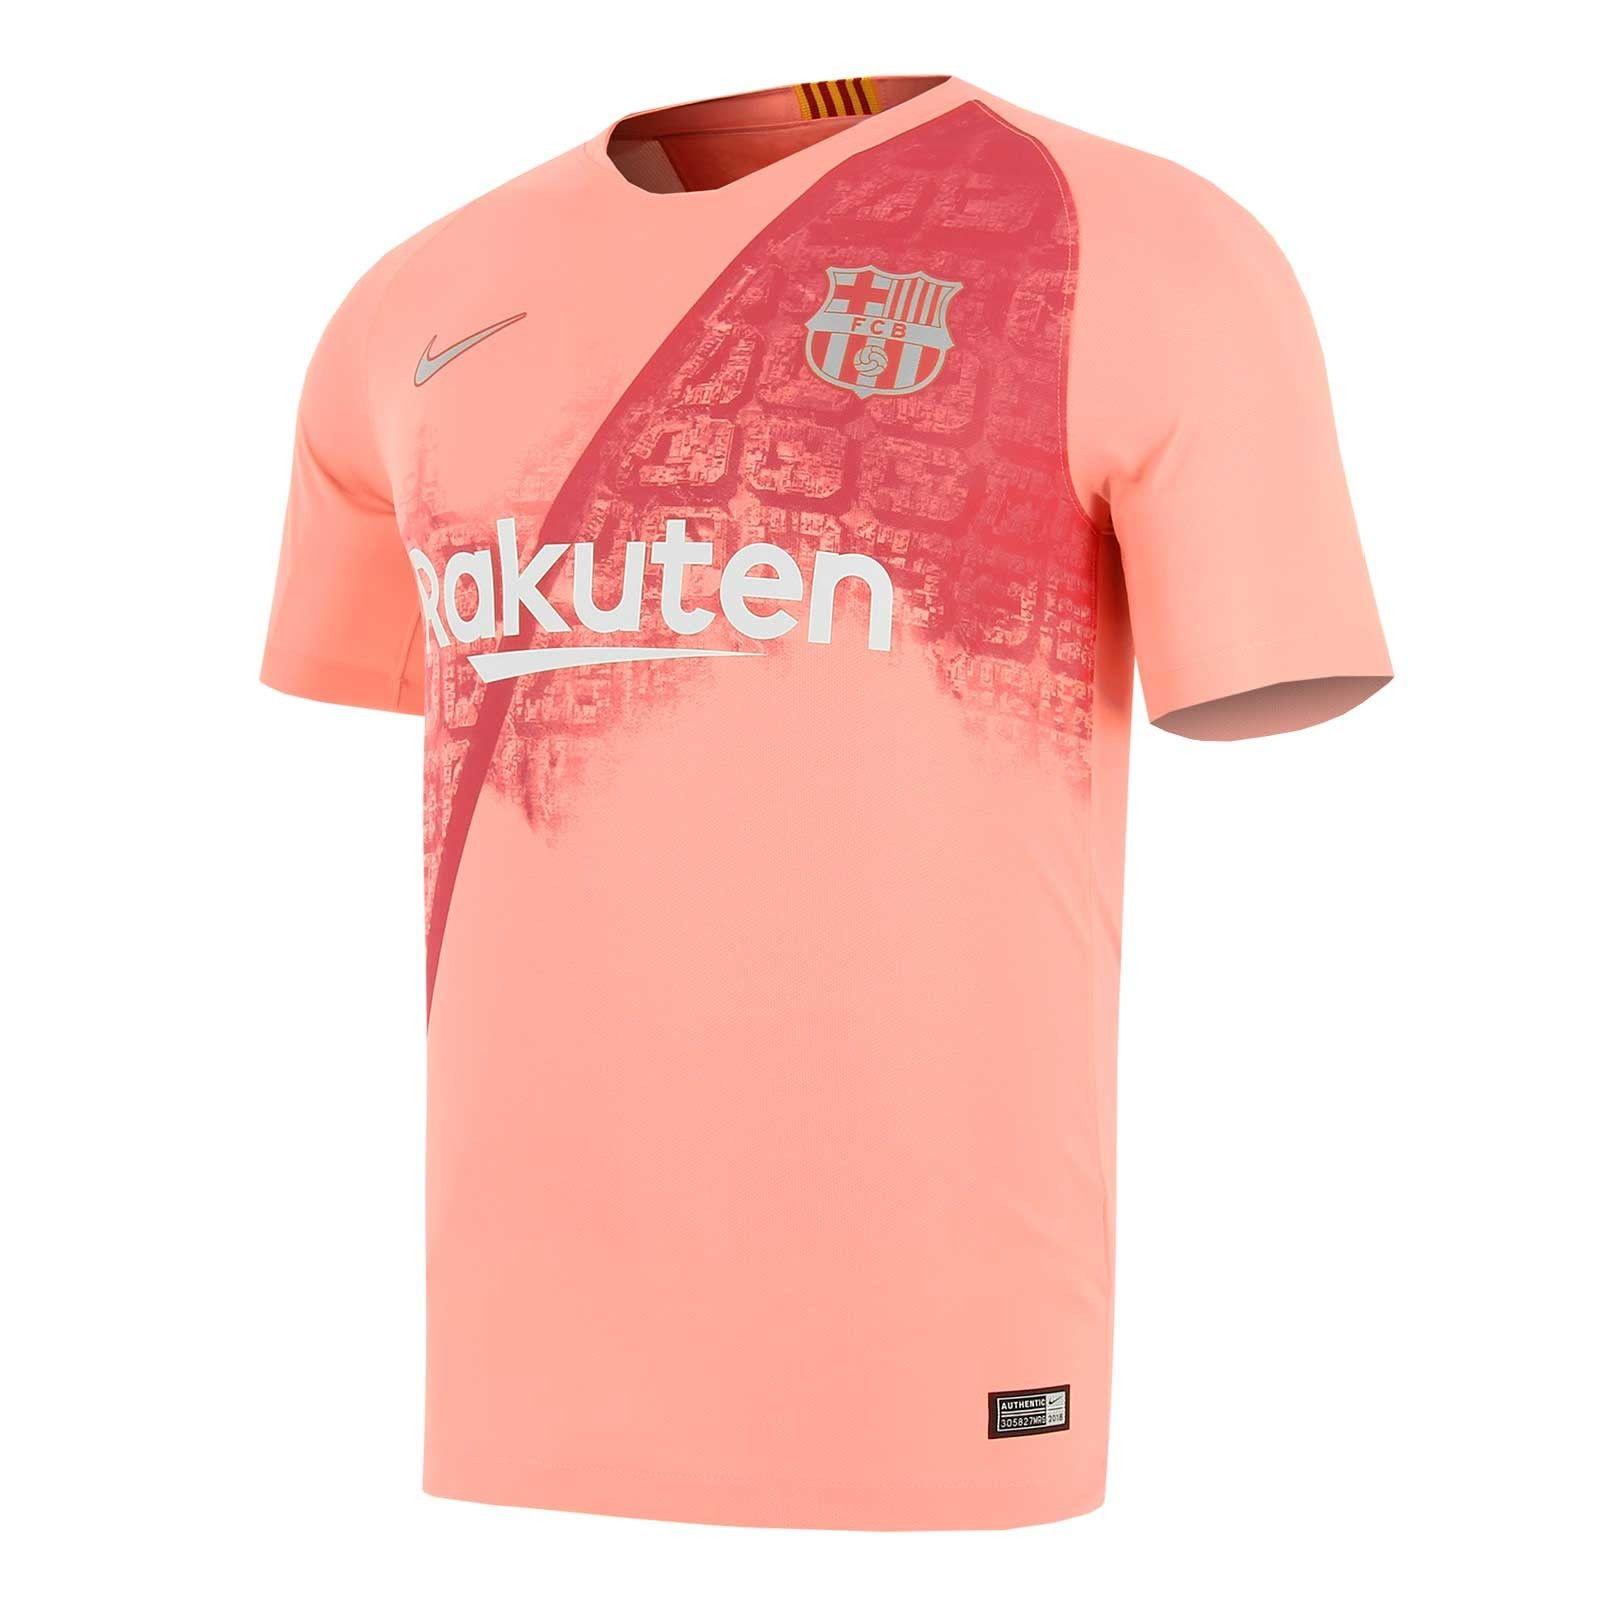 Camiseta Nike Barcelona 3a 2018 2019 Stadium  9771e890cafbf